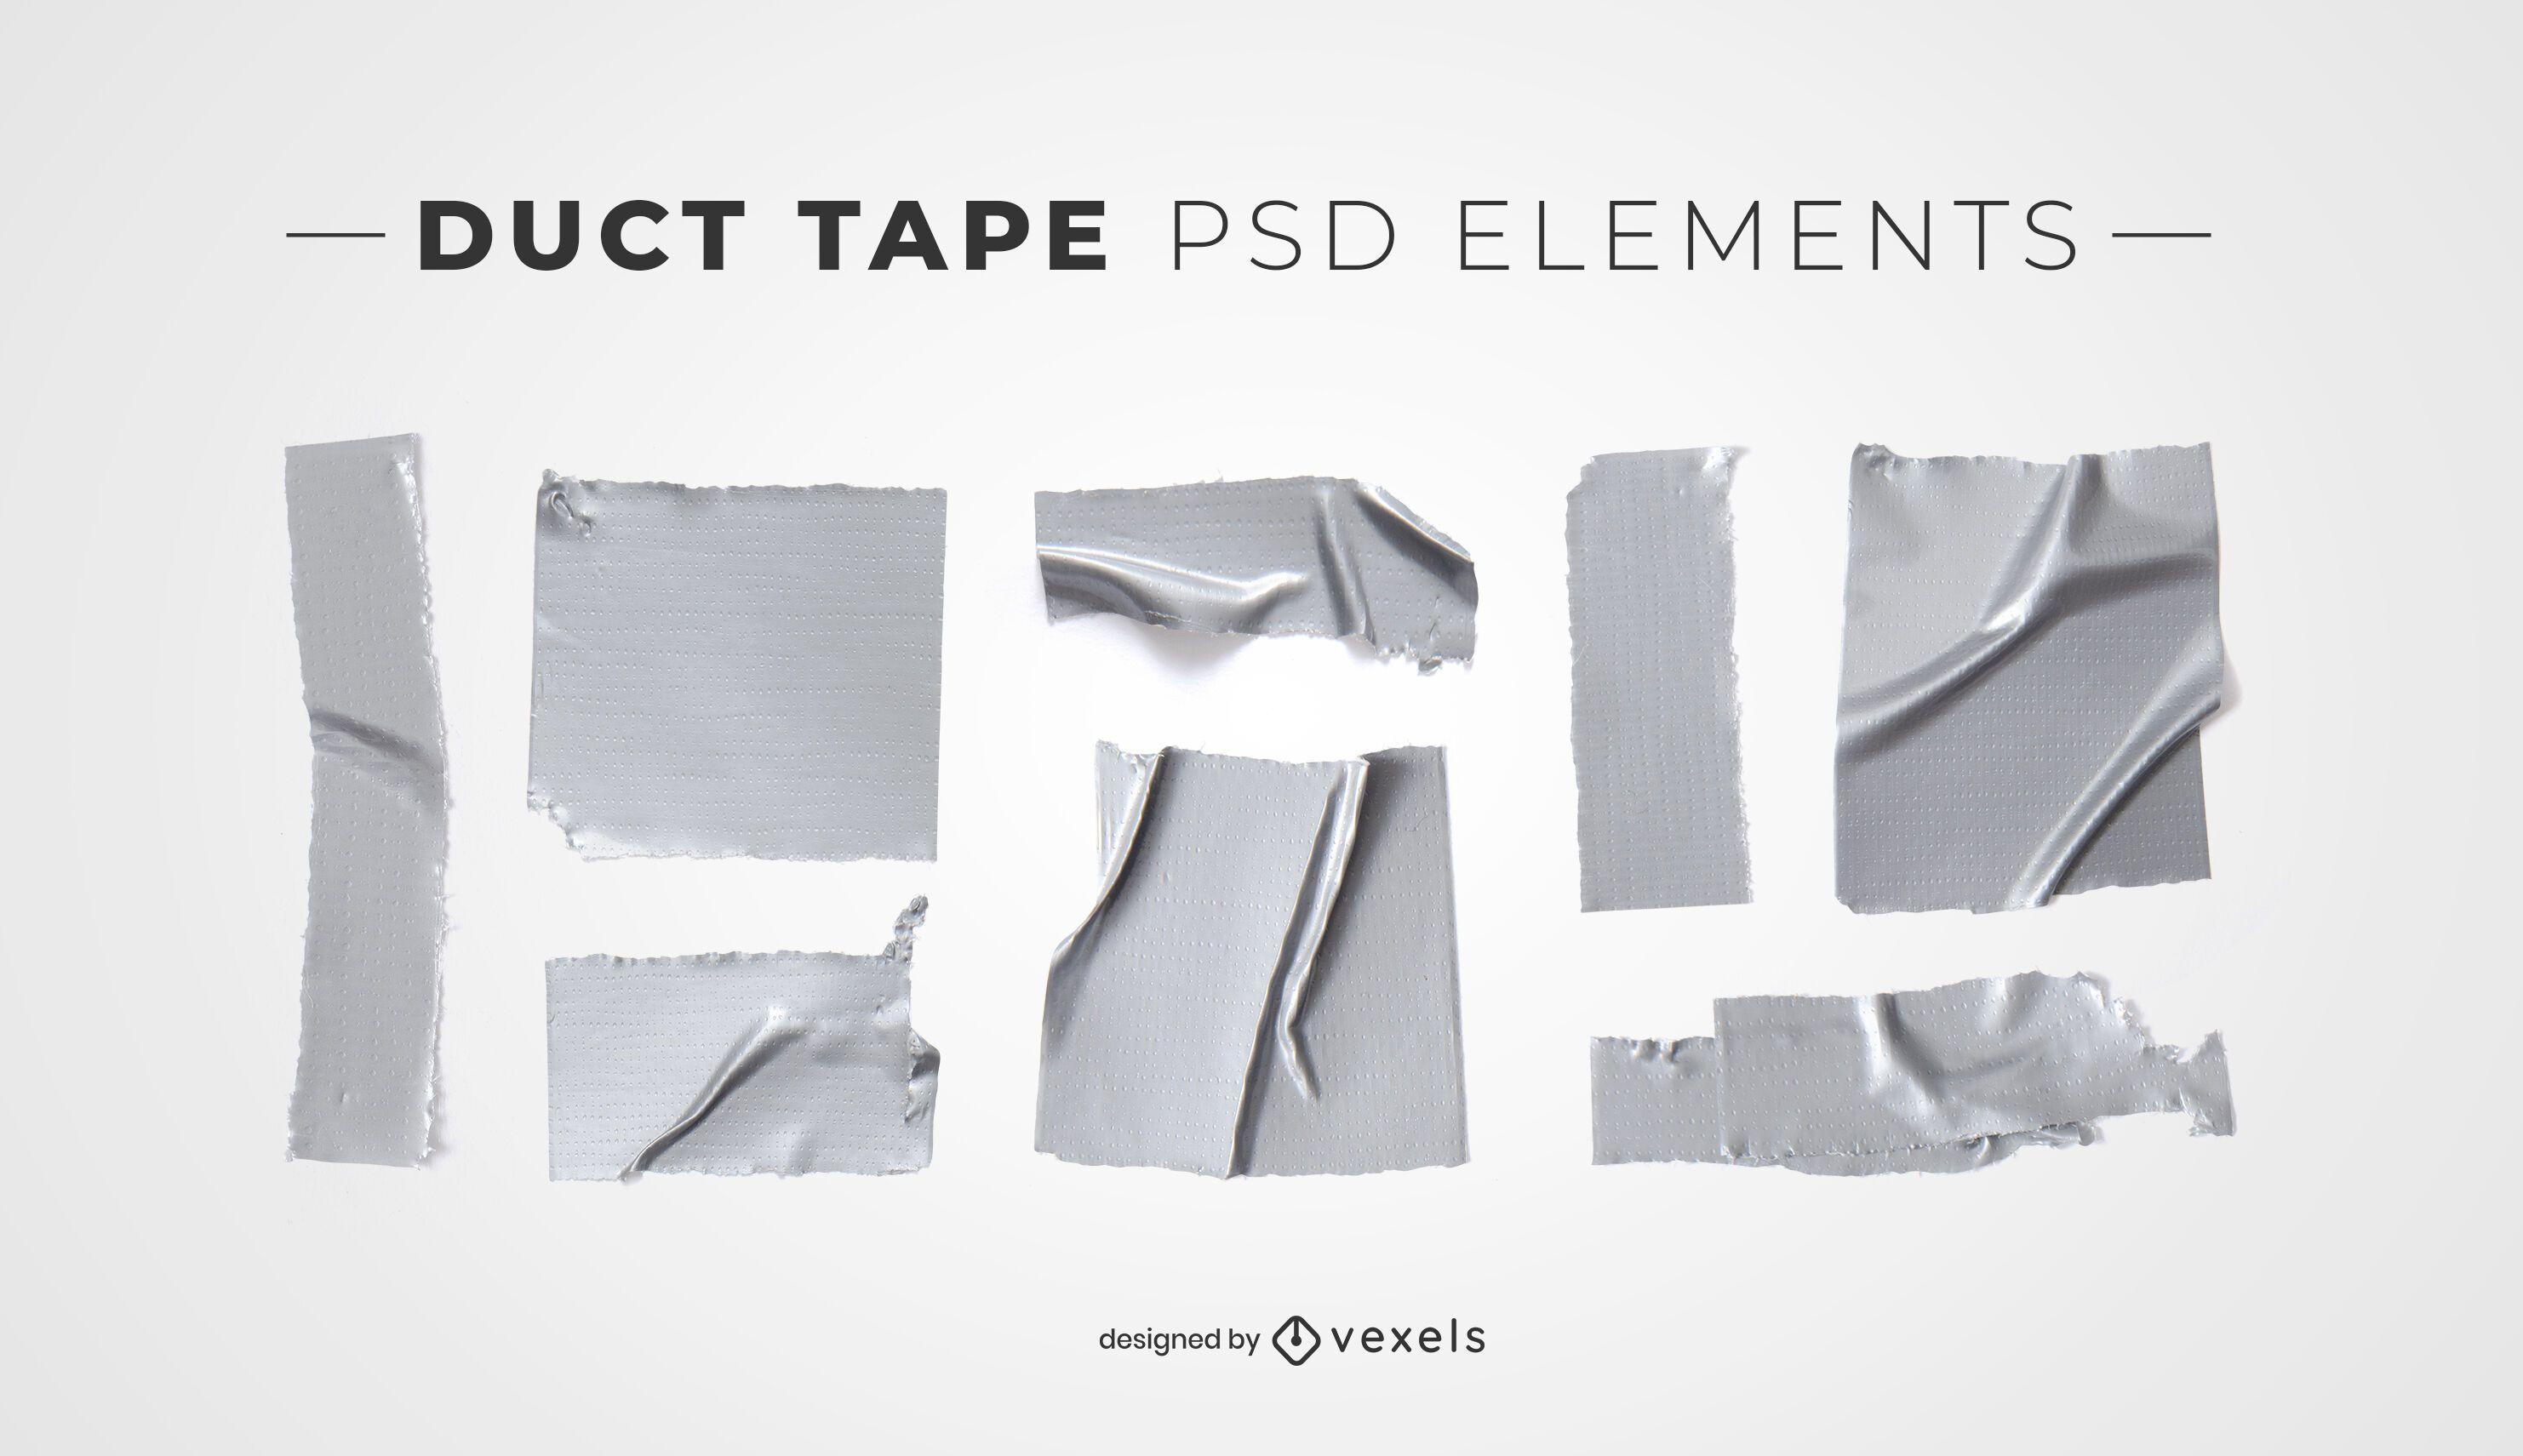 Elementos psd de cinta adhesiva para maquetas.